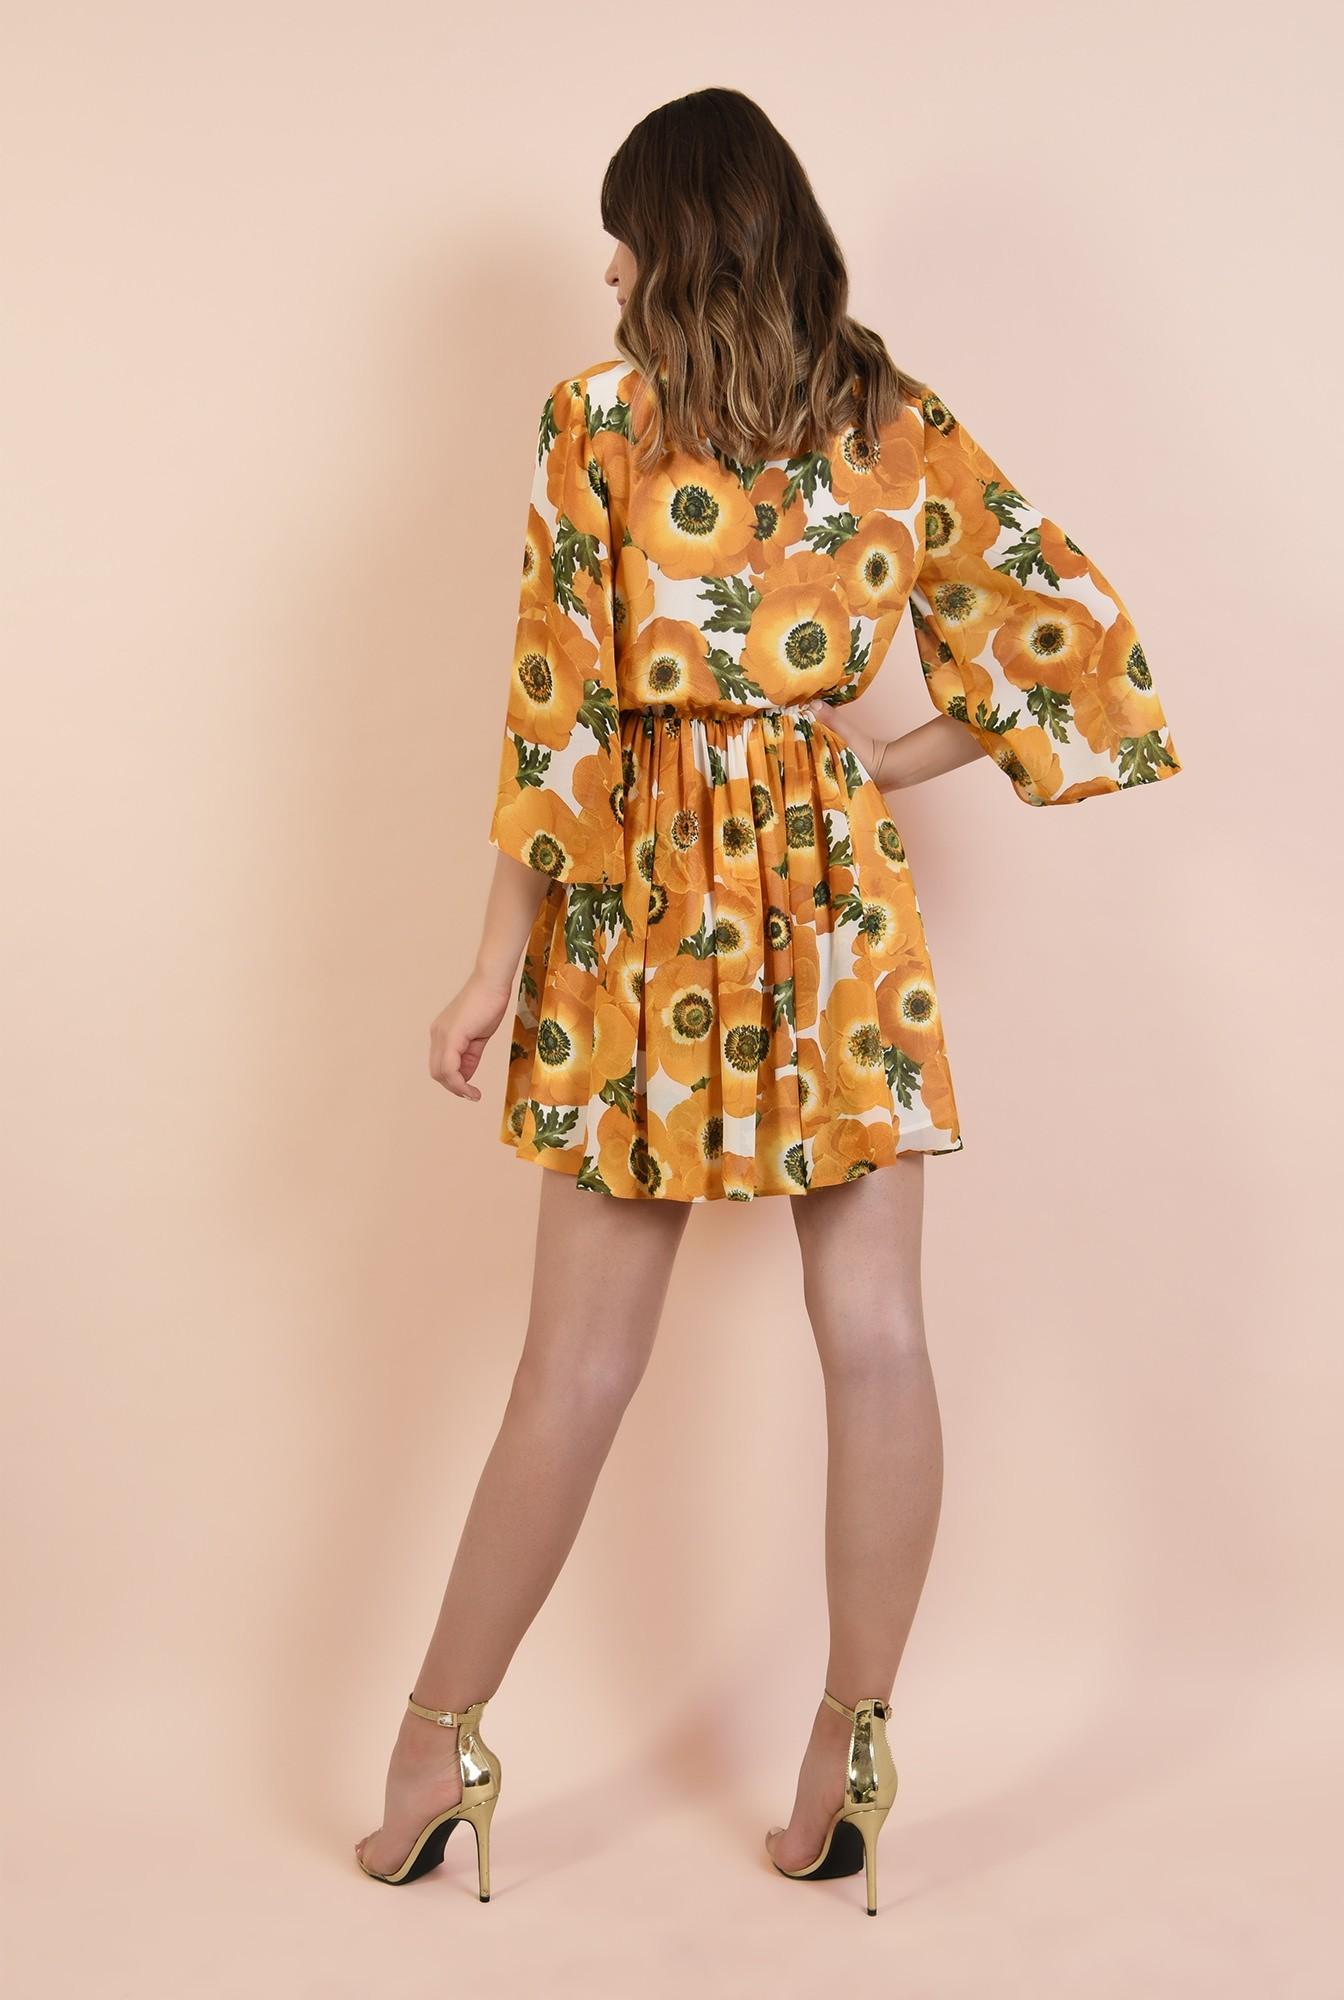 1 - 360 - rochie imprimata, casual, clos, talie pe elastic, motive florale